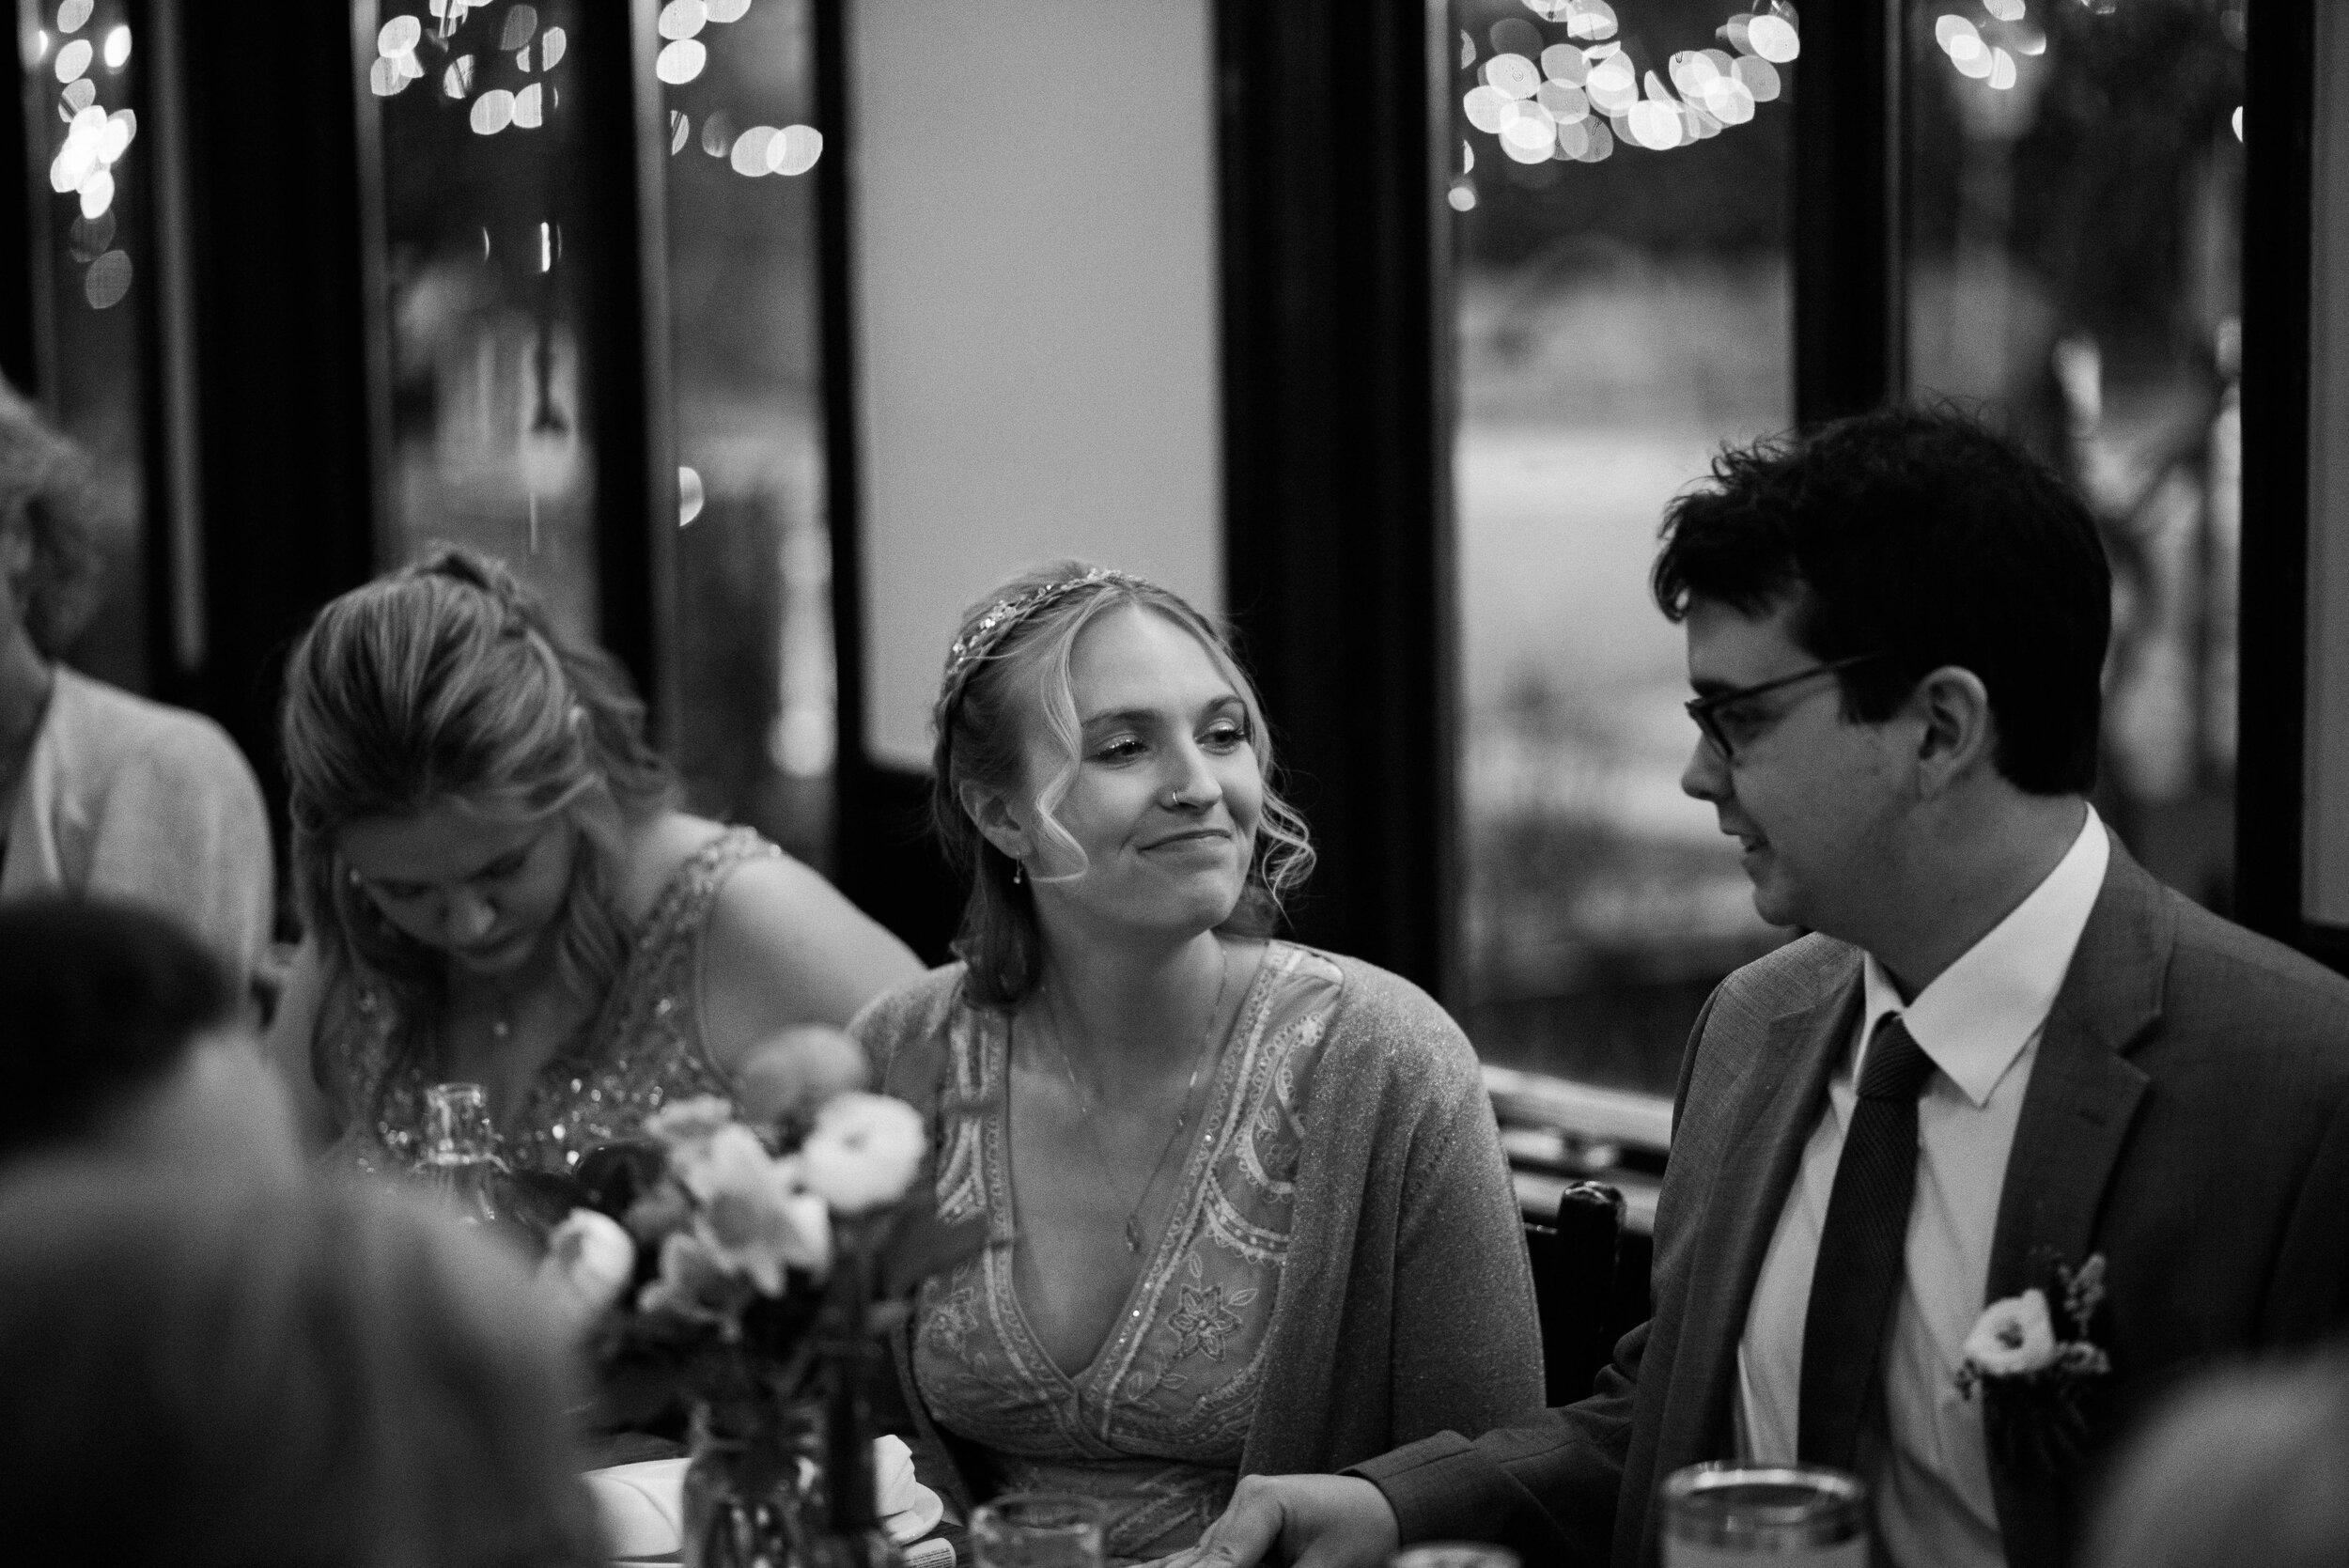 Cozy Winter Wedding at Big Bear Cafe